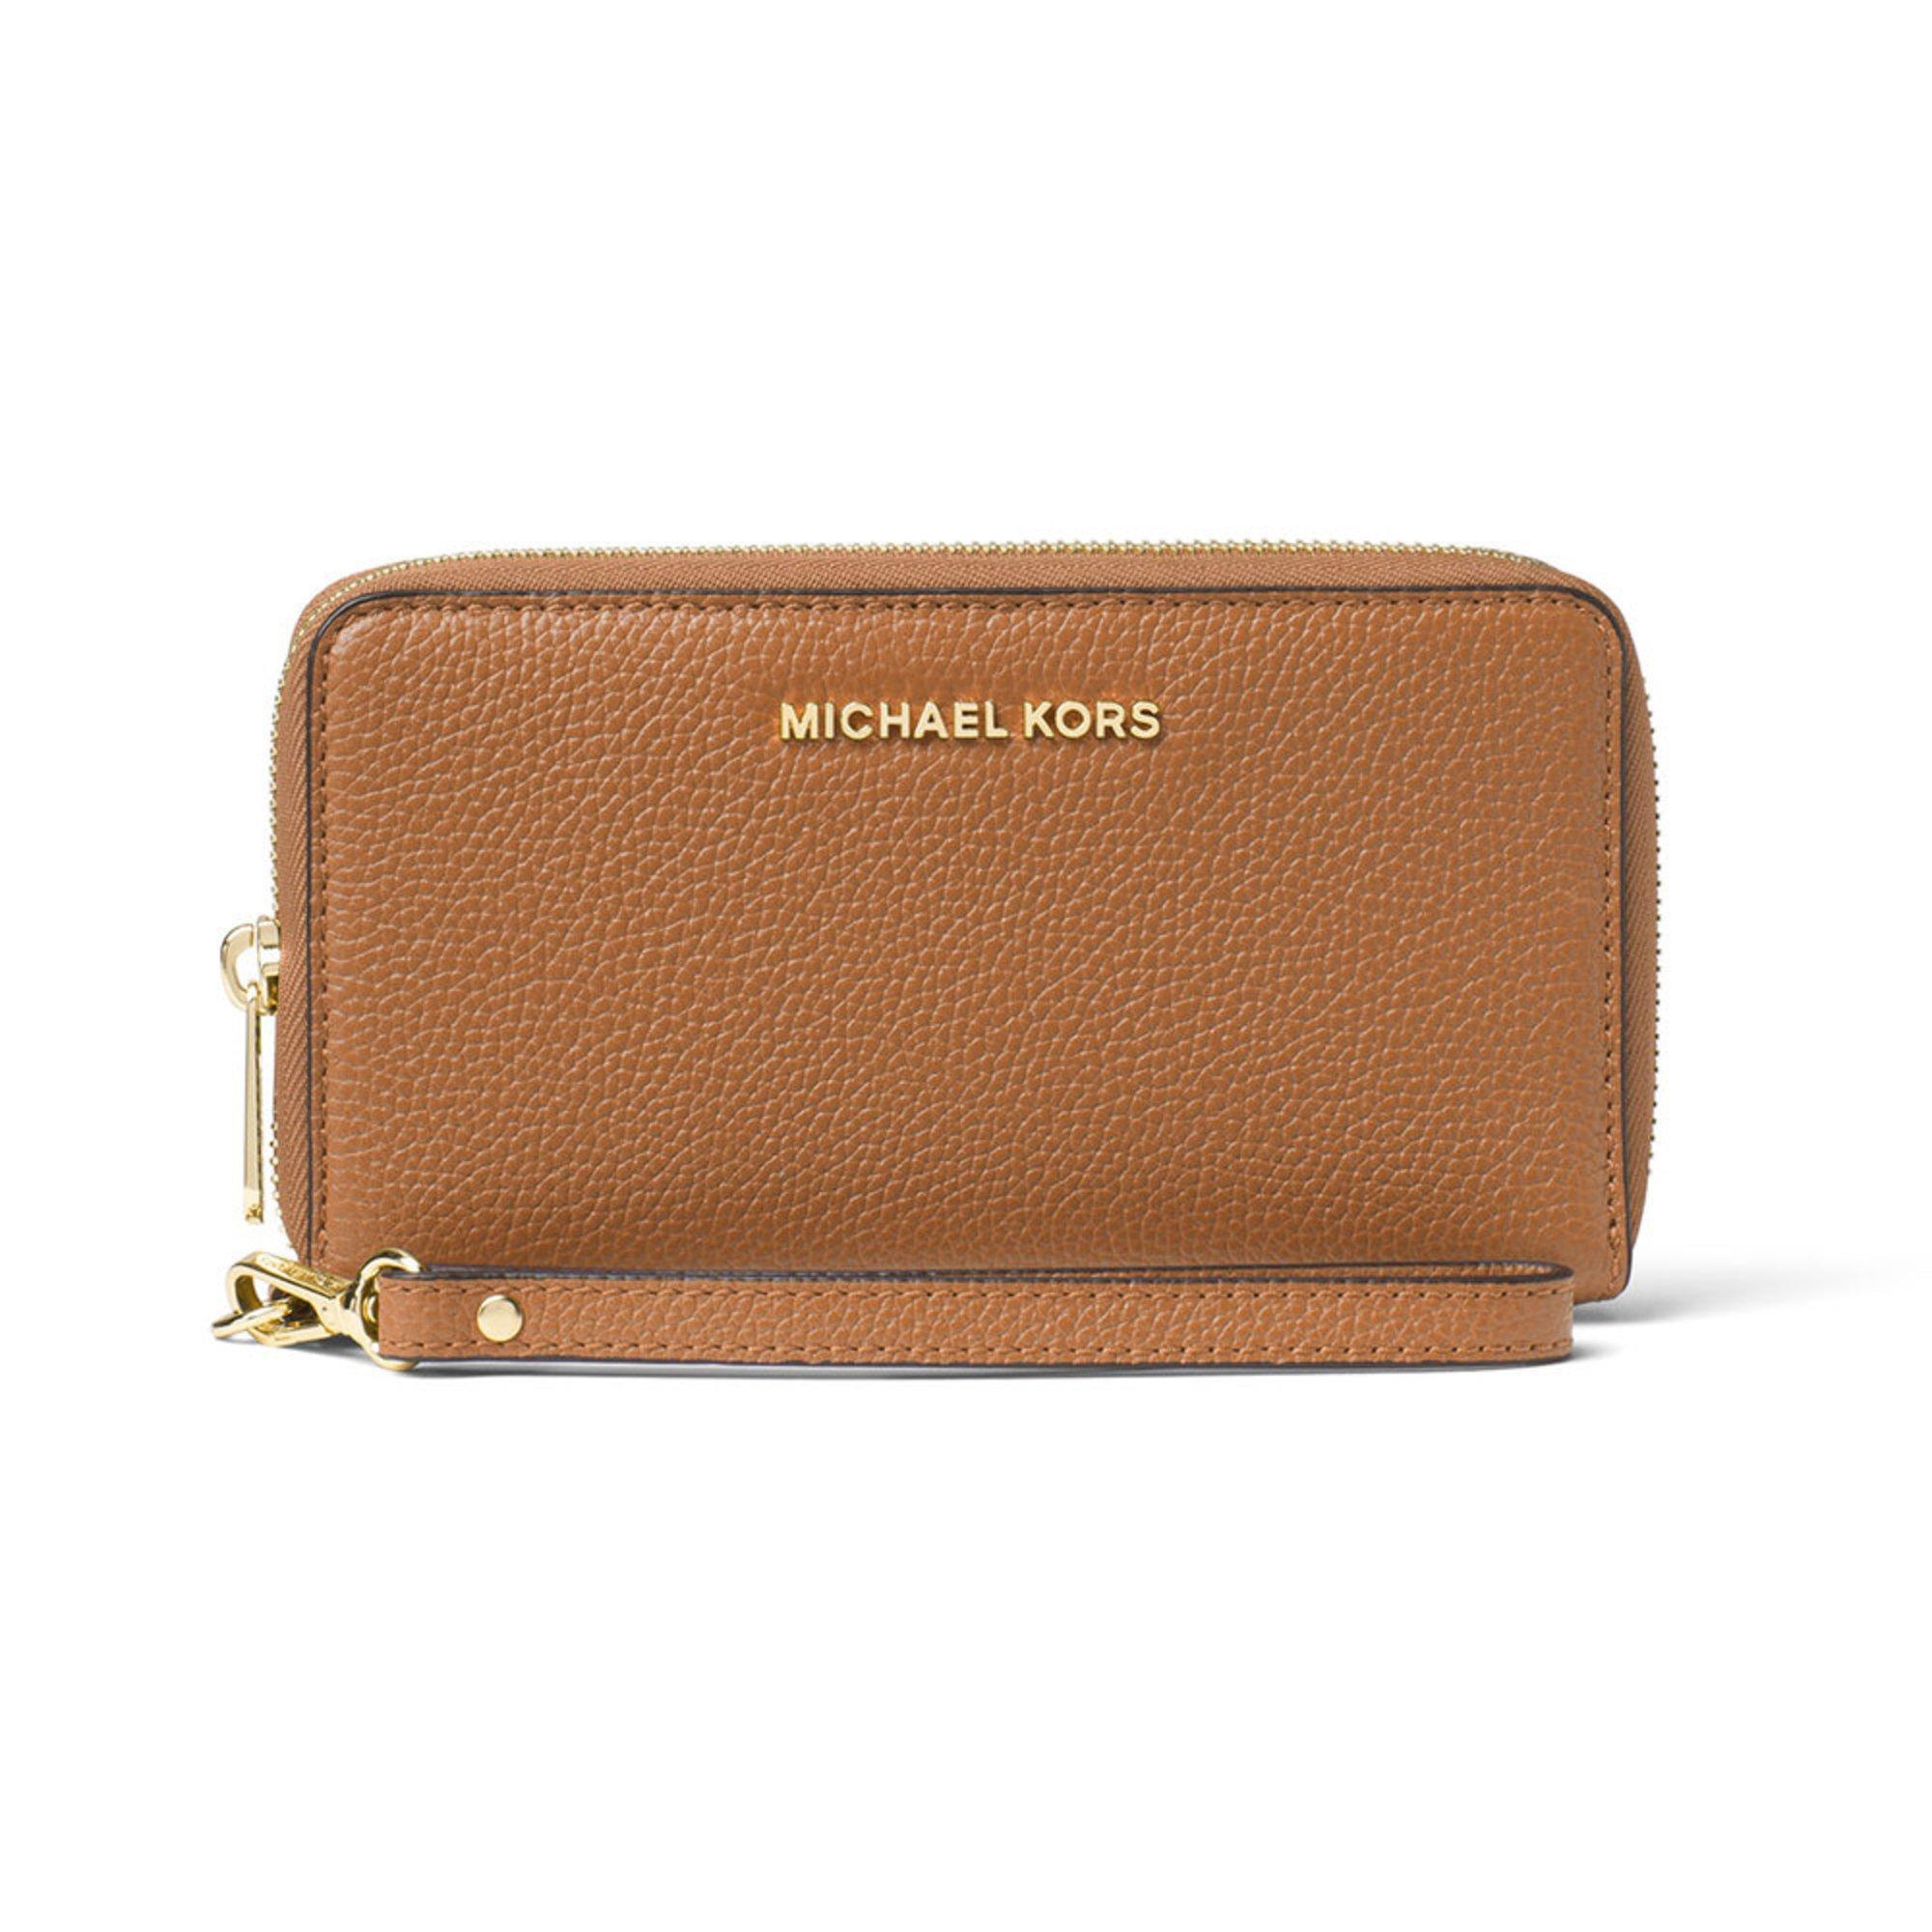 bb6dd0cf1ab3 Michael Kors Mercer Large Flat Multifunction Case Acorn   Wristlets ...